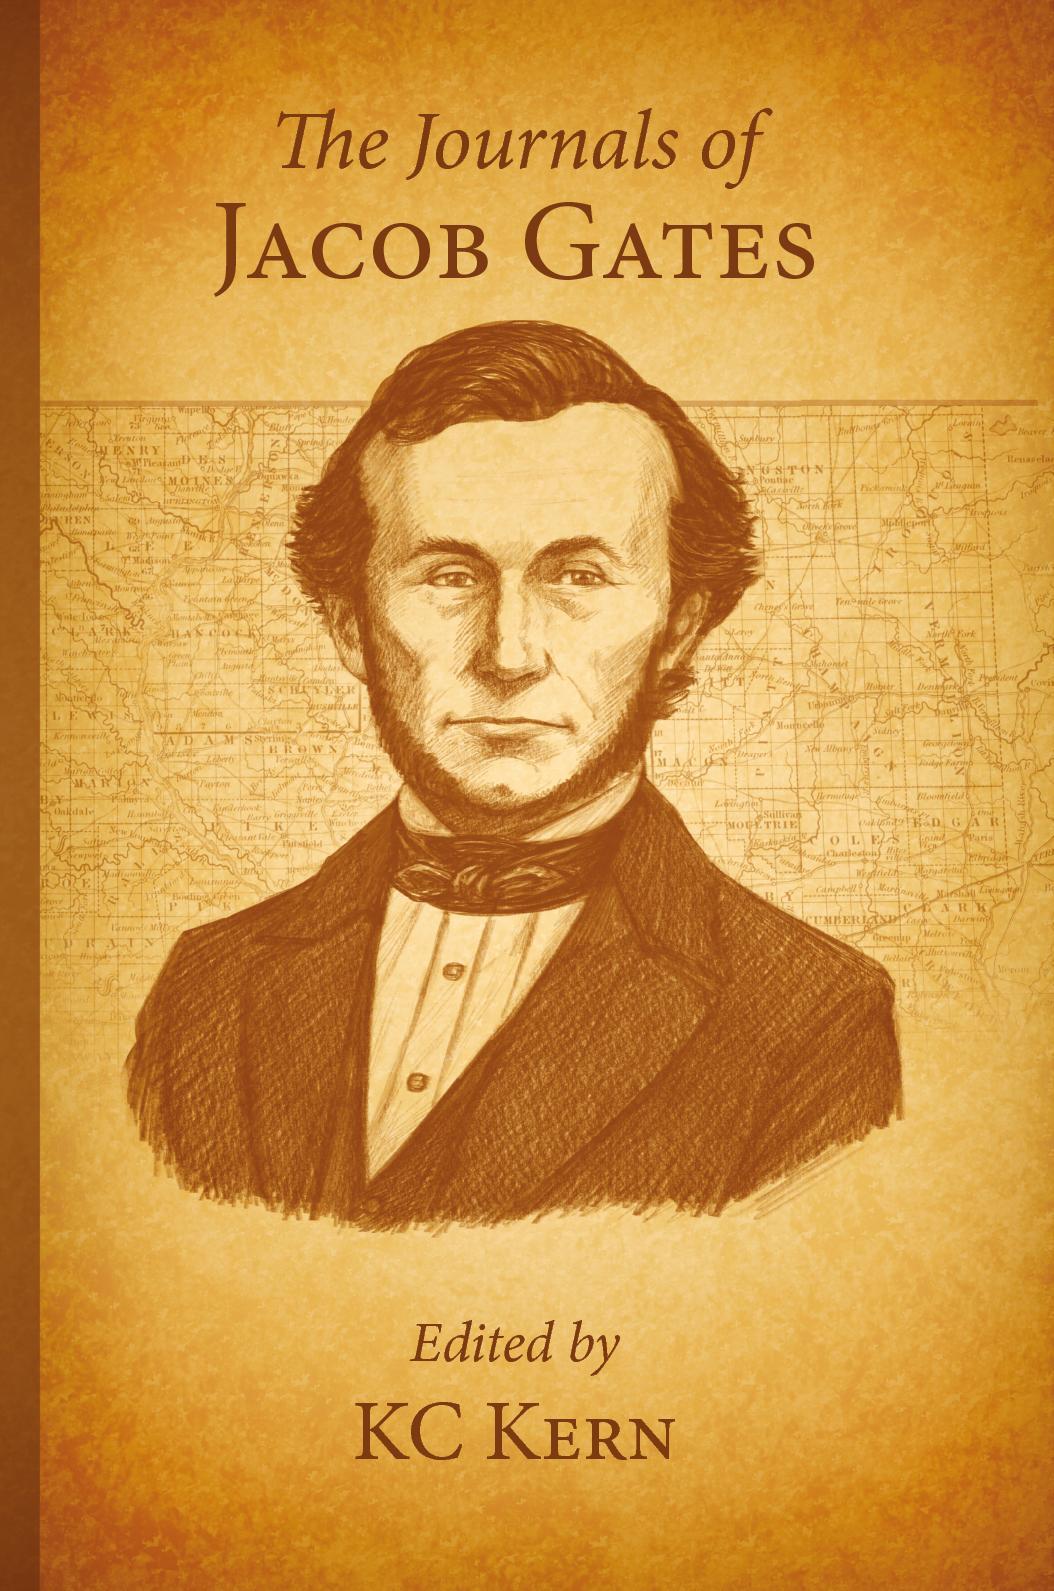 Calamo The Journals Of Jacob Gates To Refreshment Knot Head Part I Mastering Eldredge